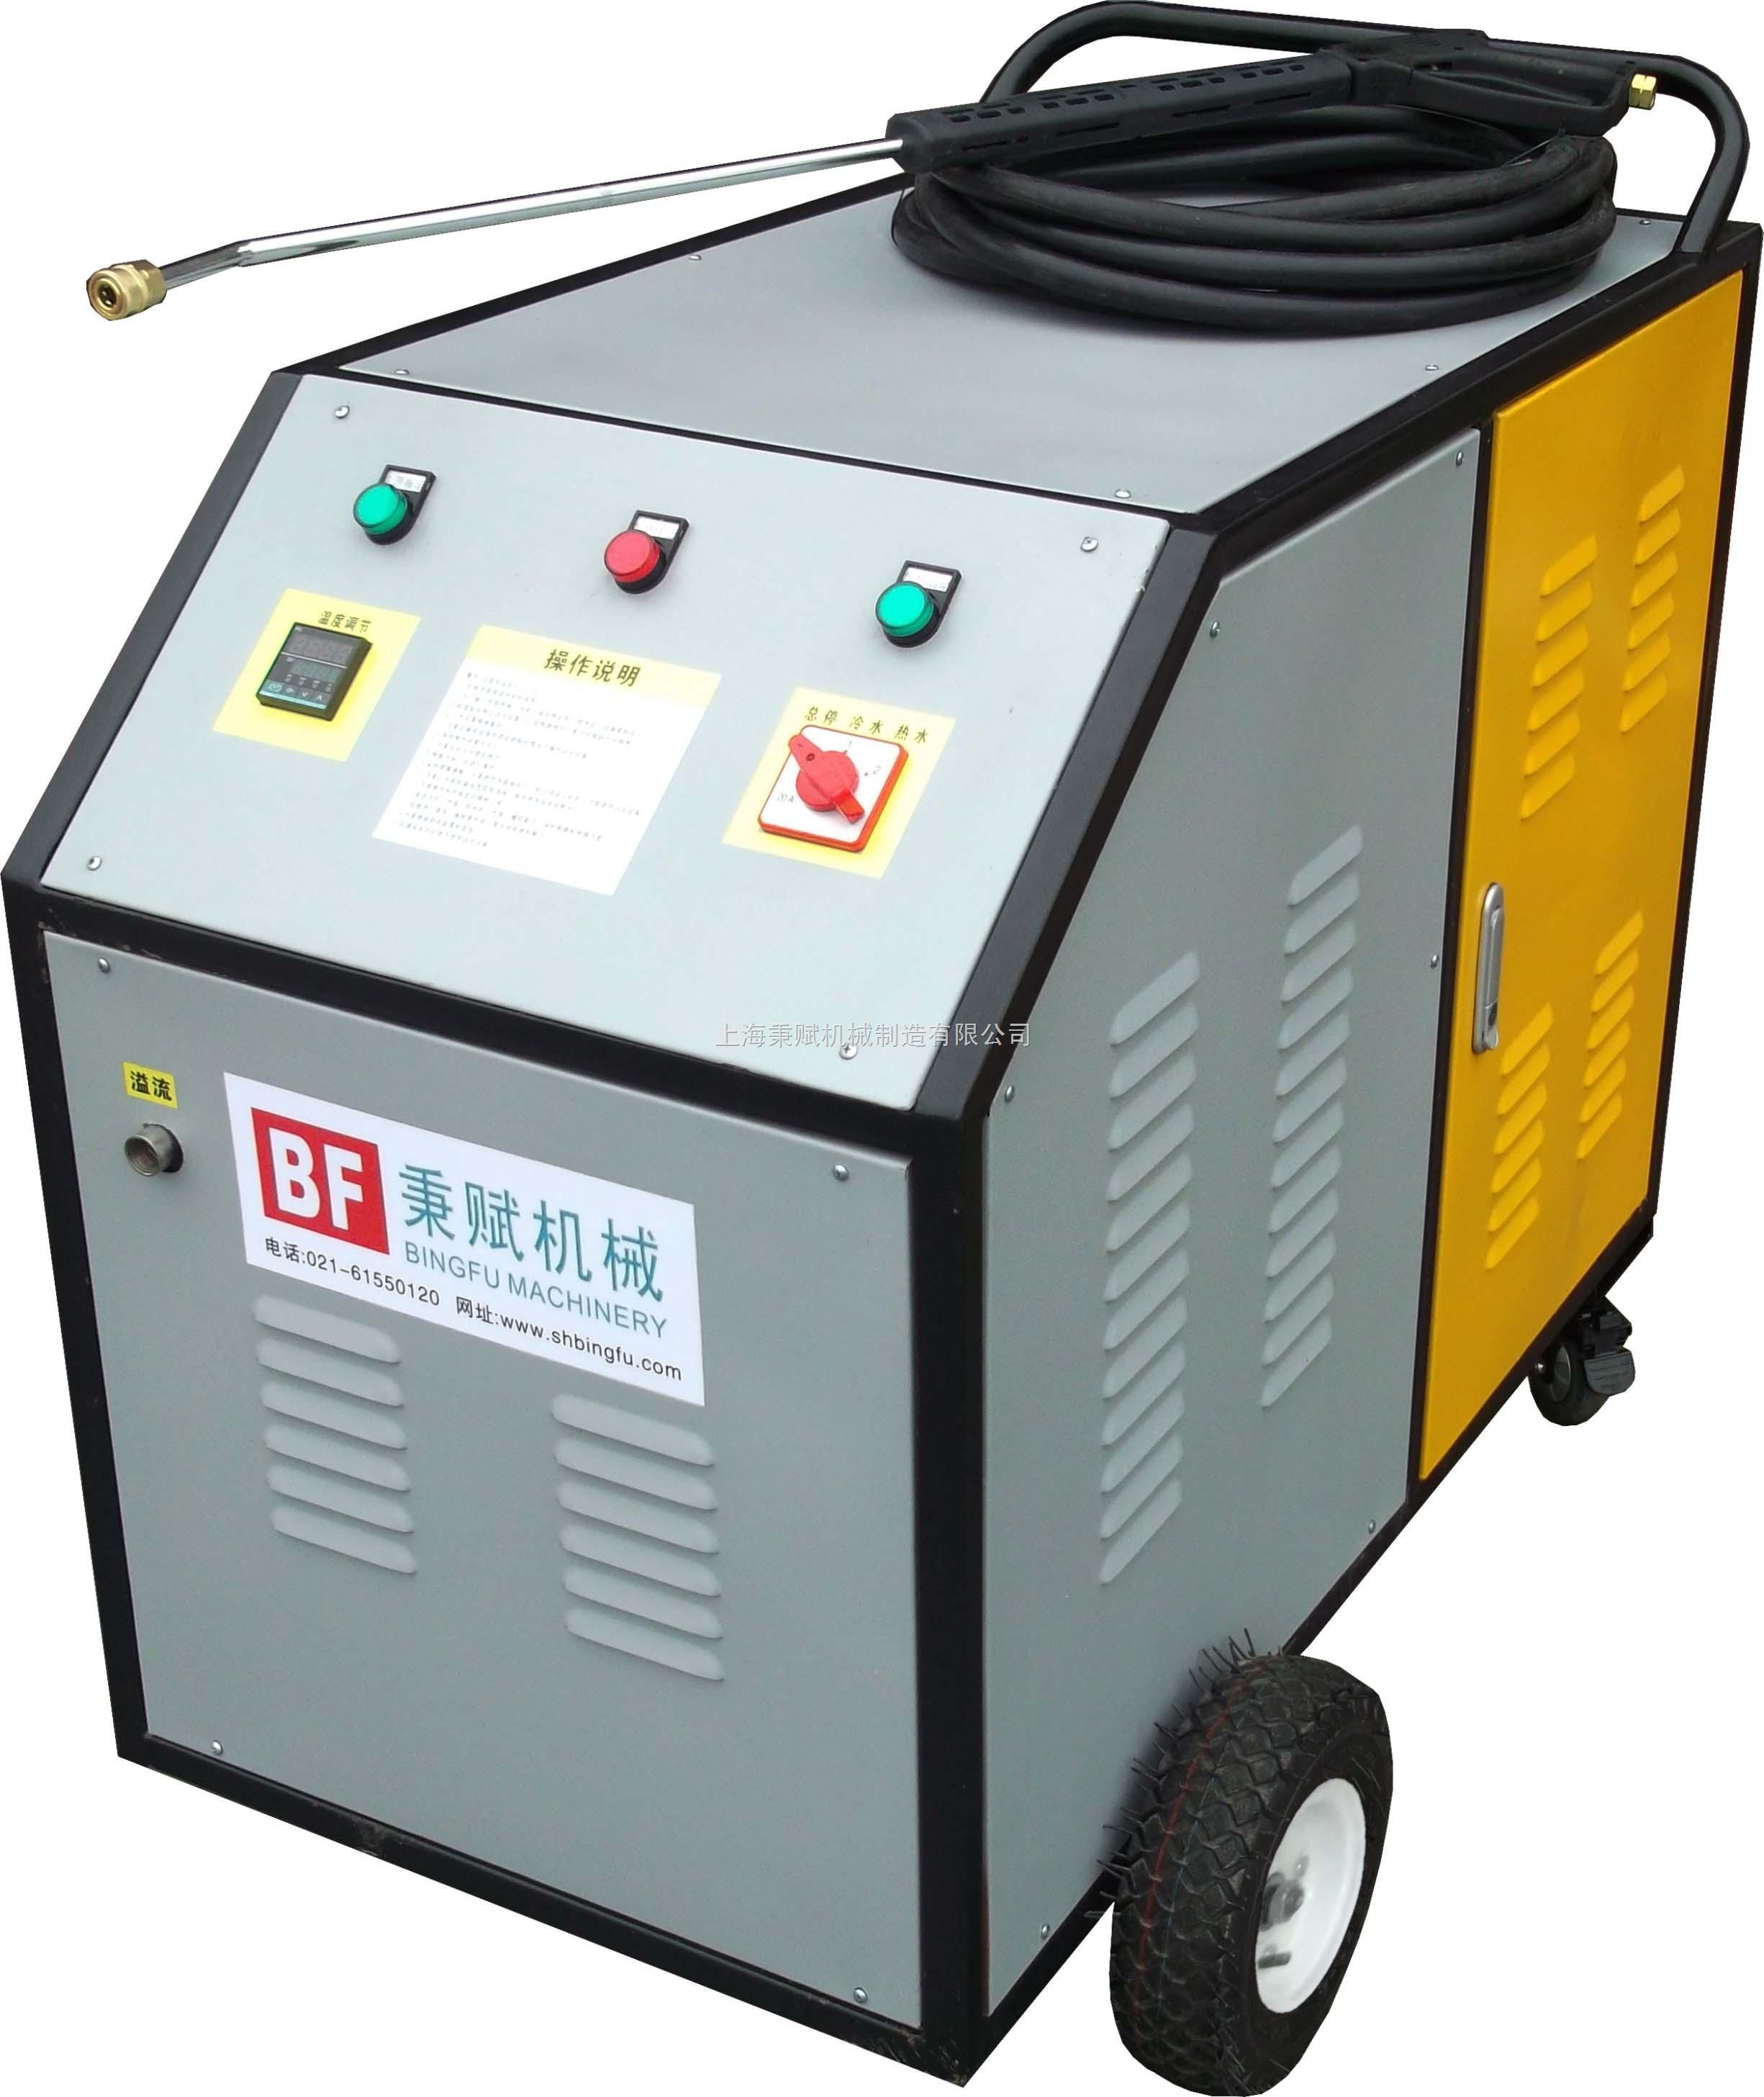 HCF系列热水高压清洗机,移动式-三相-电加热型 全电型冷、热水高压清洗机是一款零排放,无污染的电加热系统,全电型冷热水高压清洗机可在封闭式房间内操作使用。设备通过自身加压、加热产生强大的水射流。零排放、无污染,被广泛用于食品加工业、化工业等。 特点: